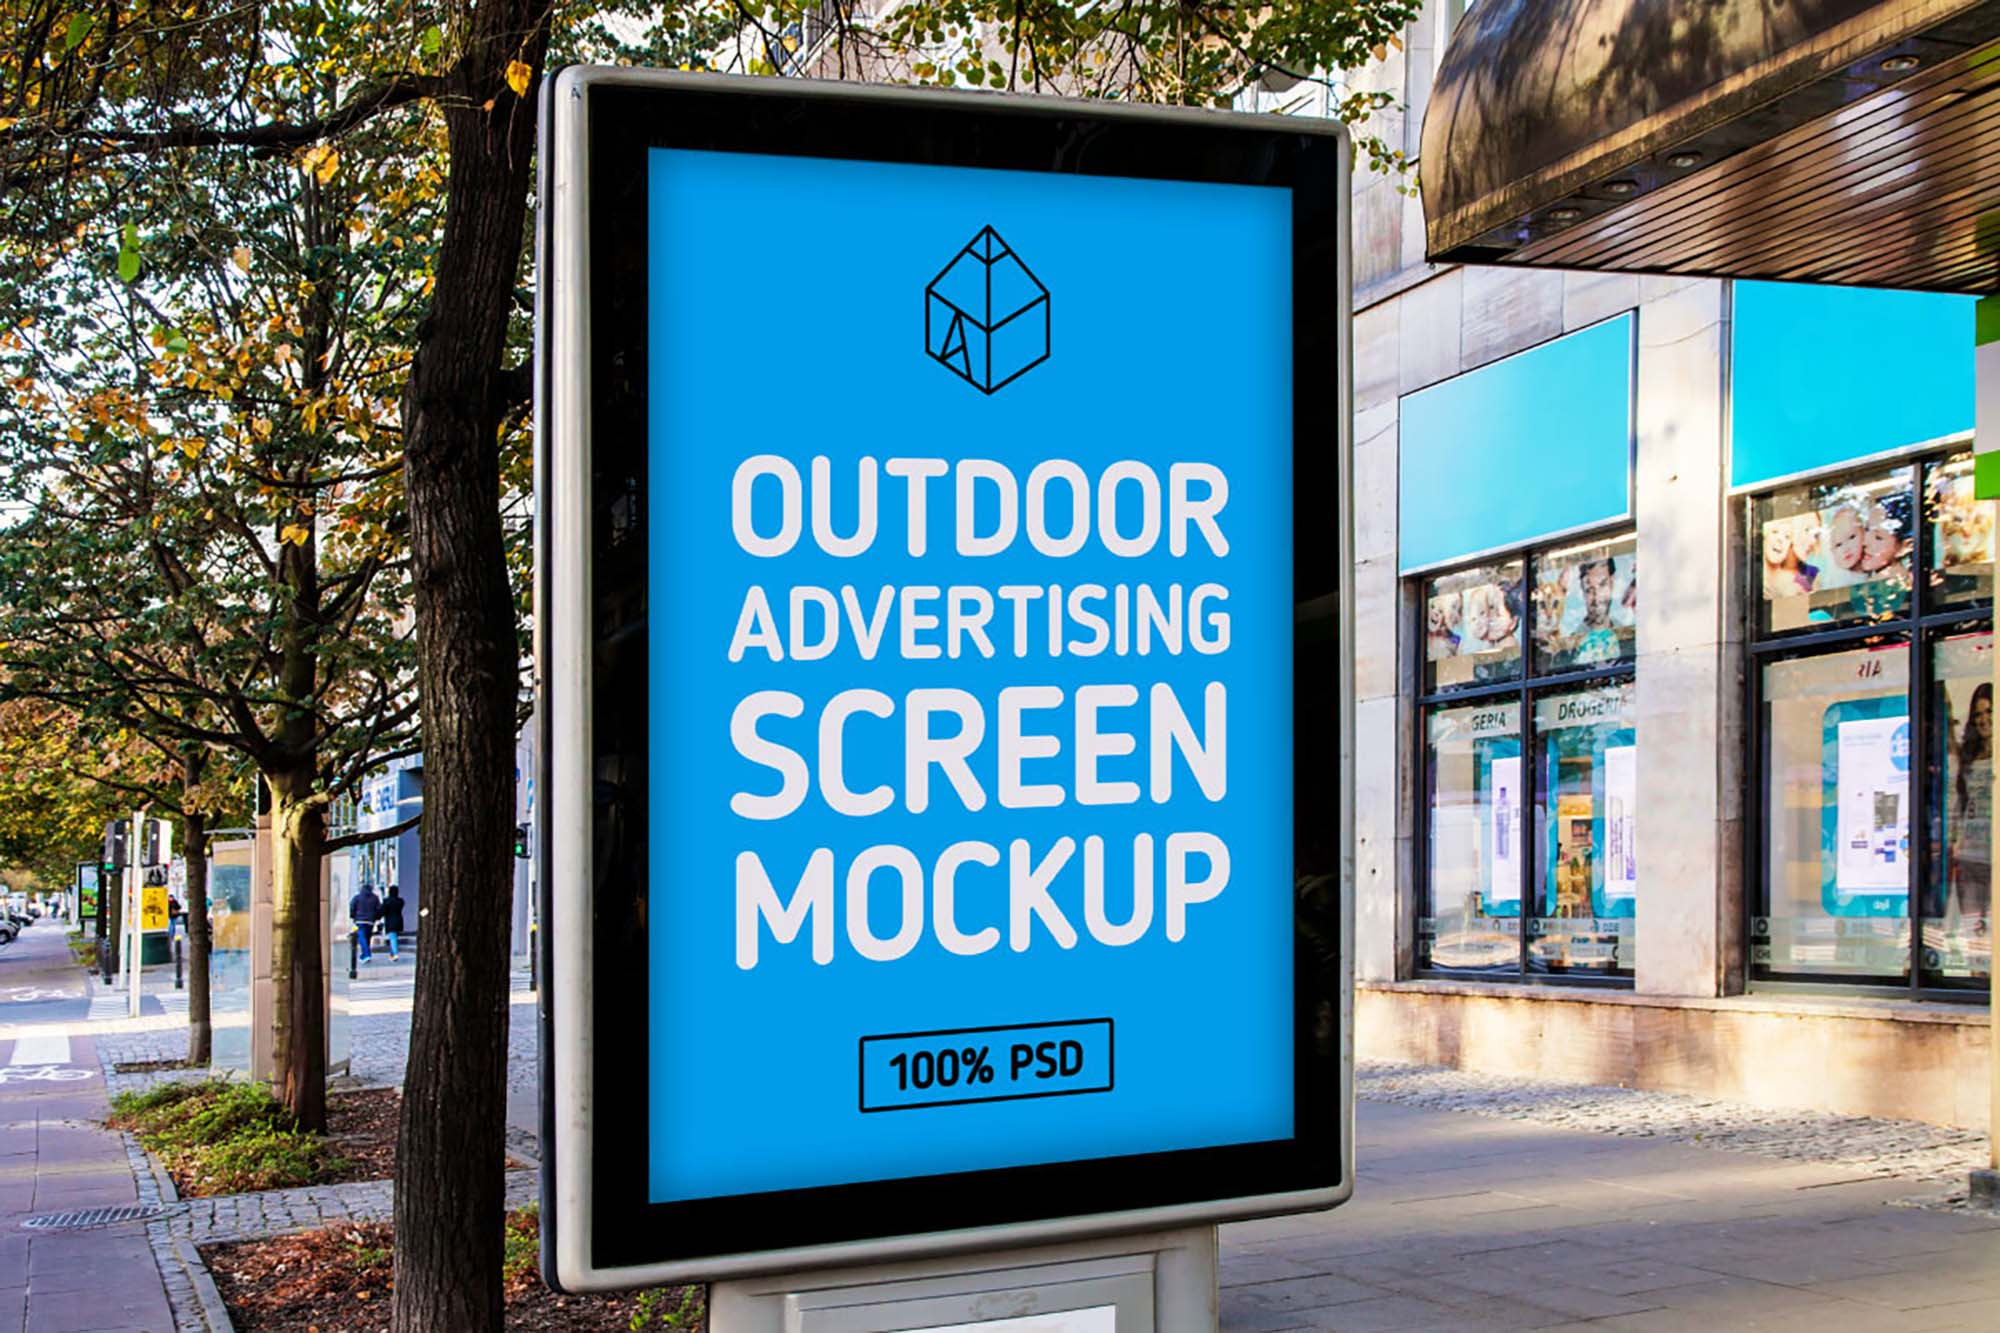 Outdoor Advertising Screen Mockup